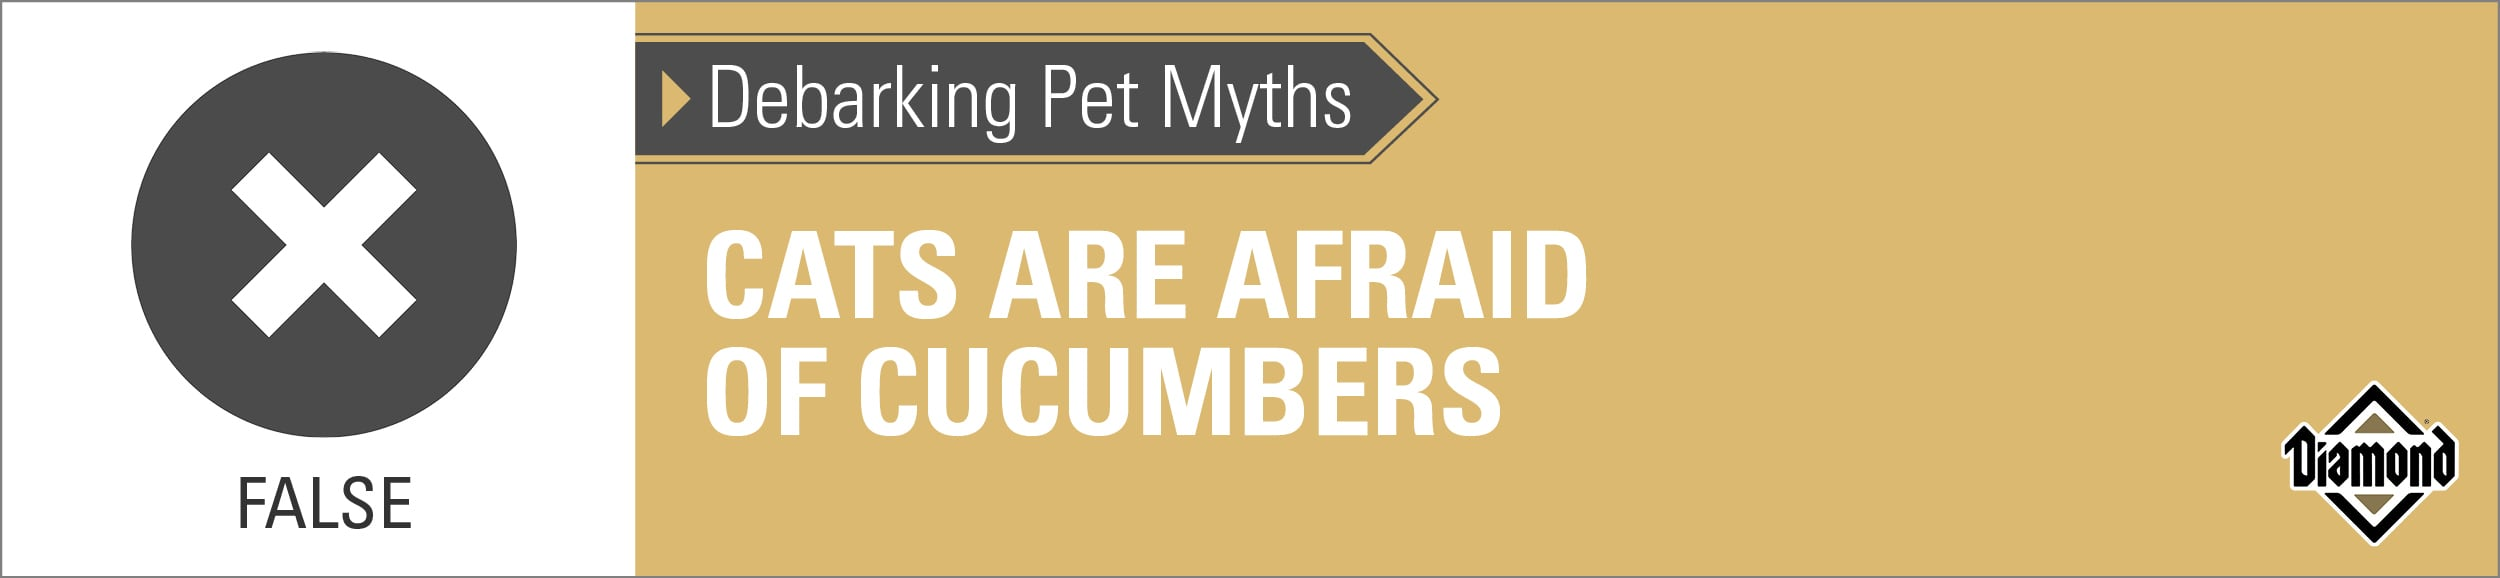 Cats are not afraid of cucumbers mythometer   Diamond Pet Foods